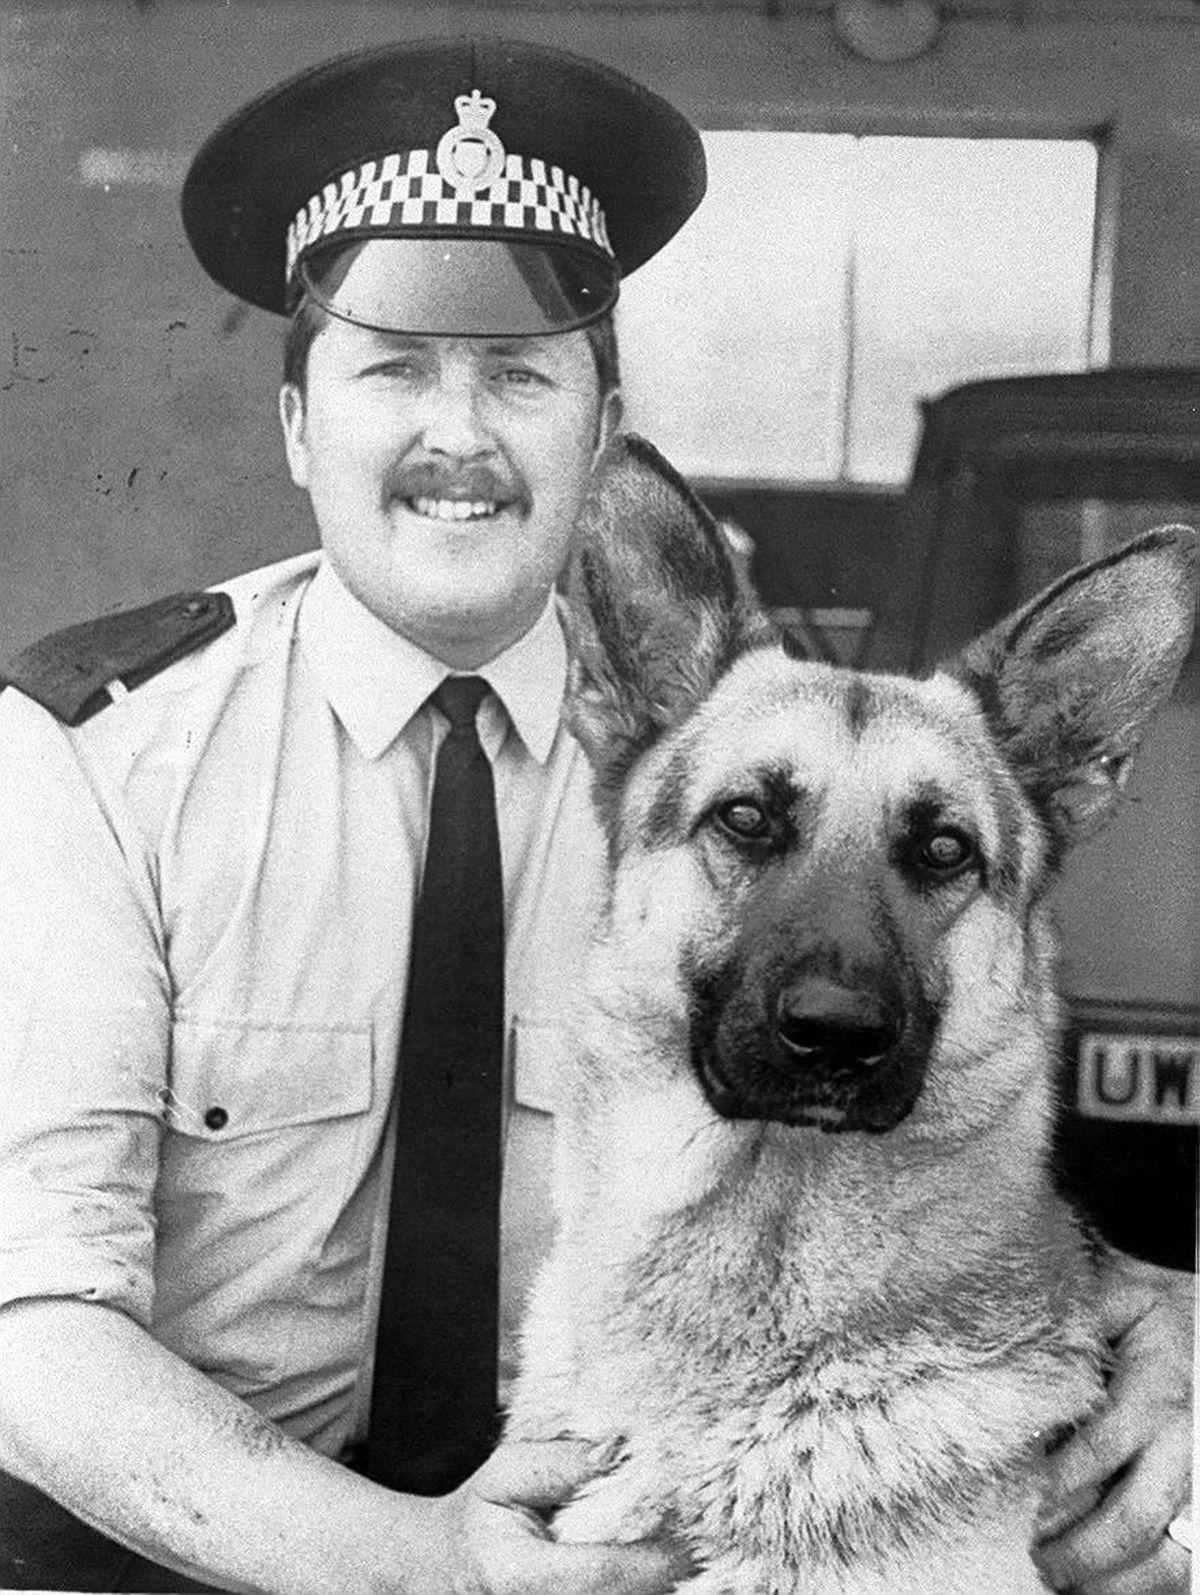 Police dog hander Ken Young and his dog Karl